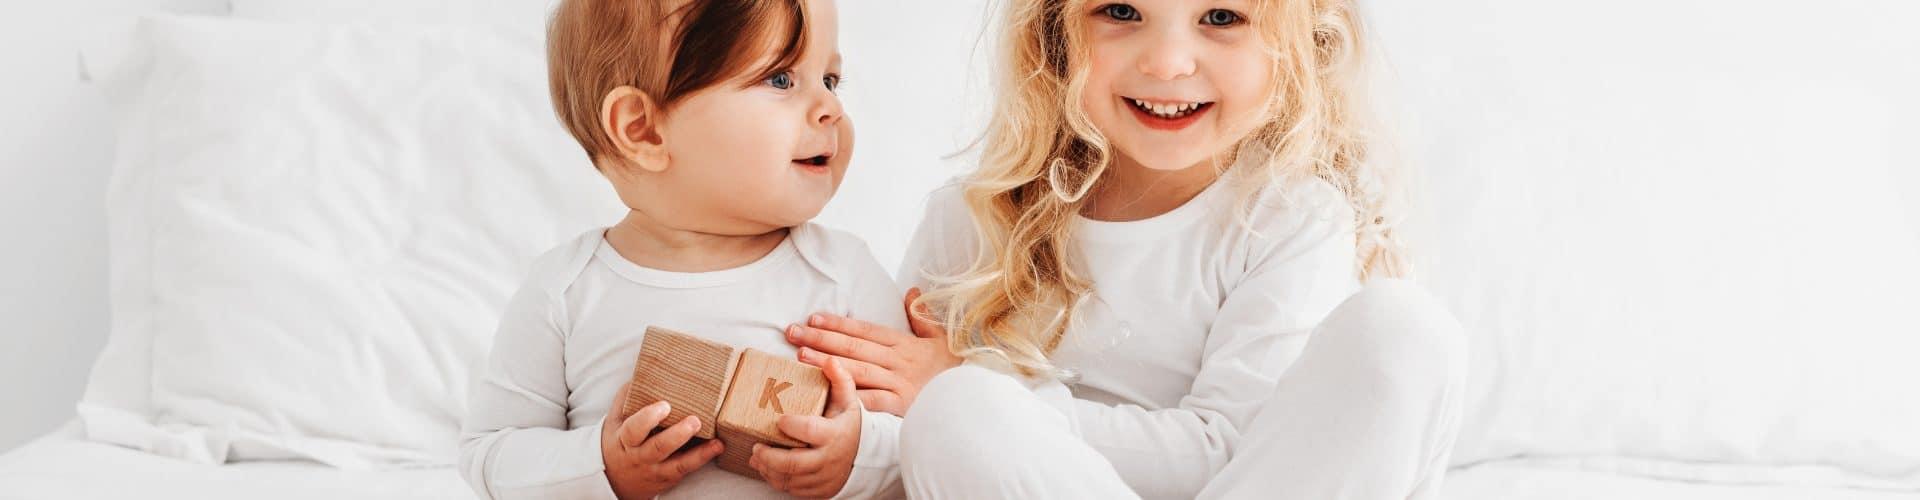 Treating Child's Eczema